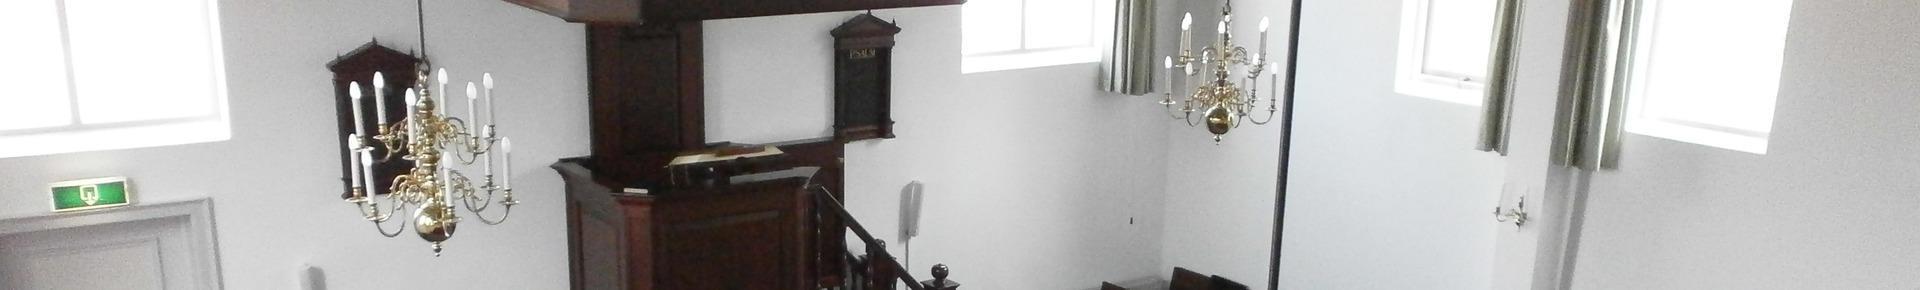 Interieur Gouderak